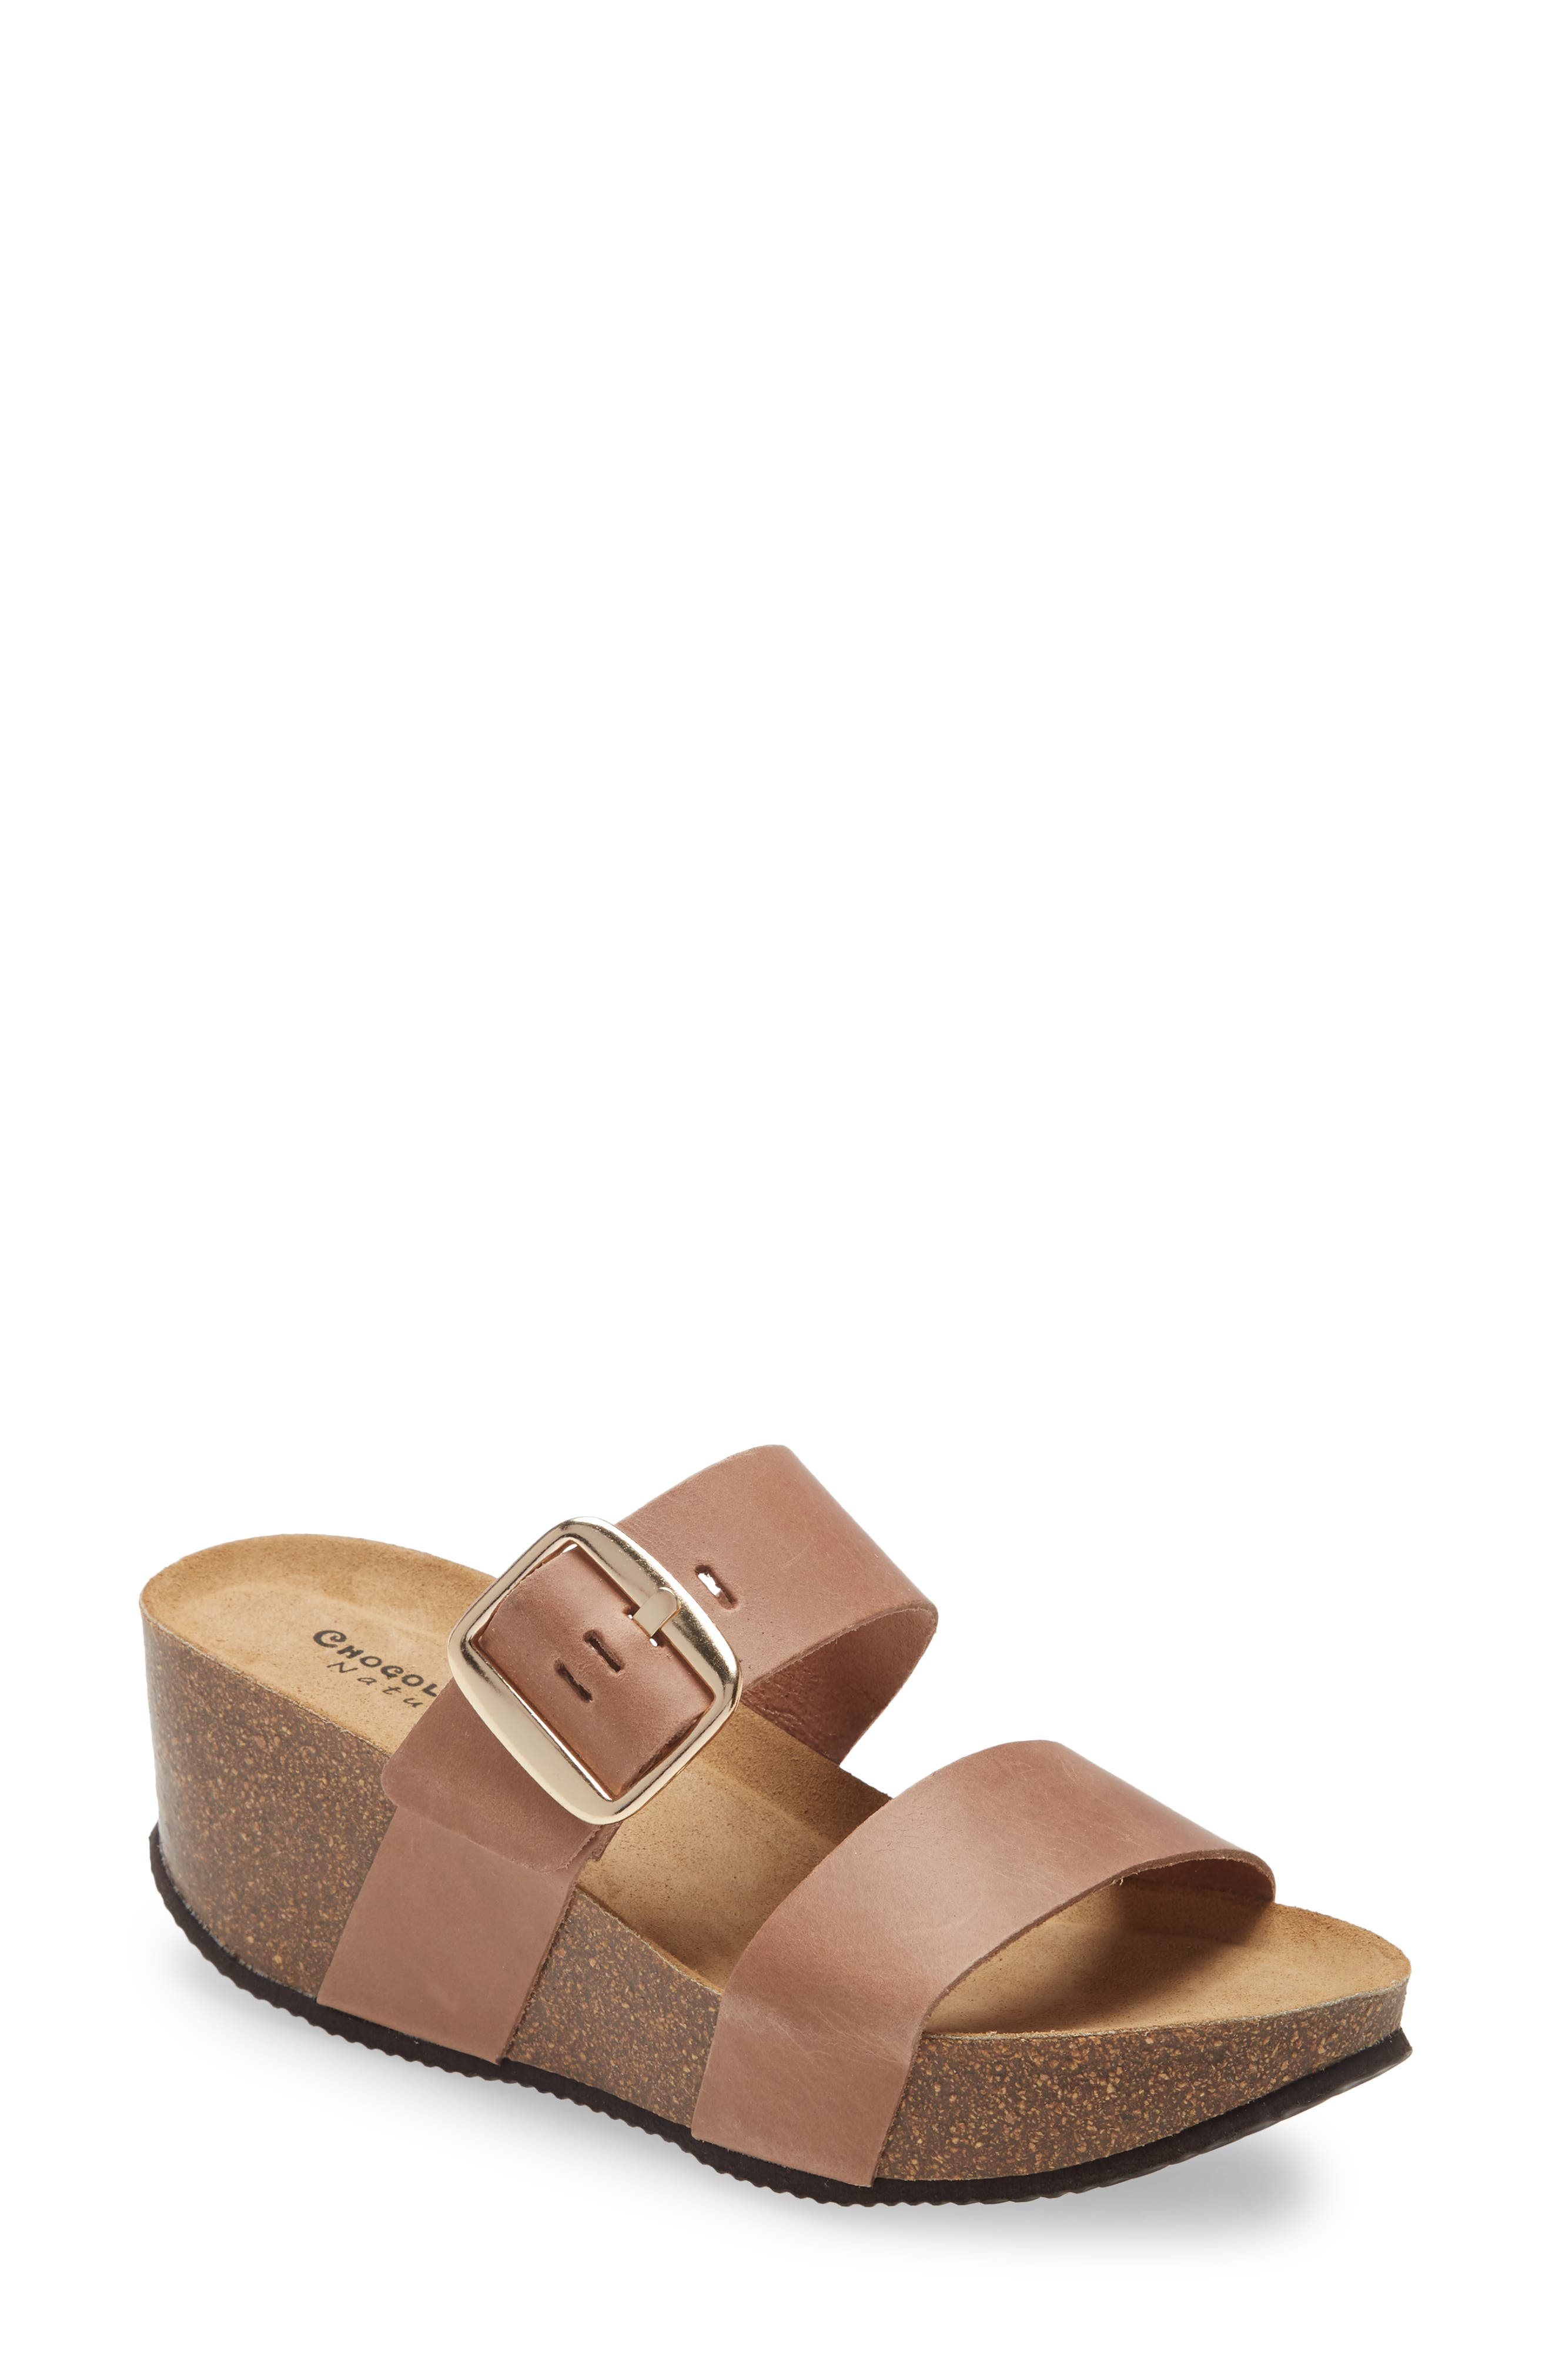 e Elle Platform Wedge Slide Sandal